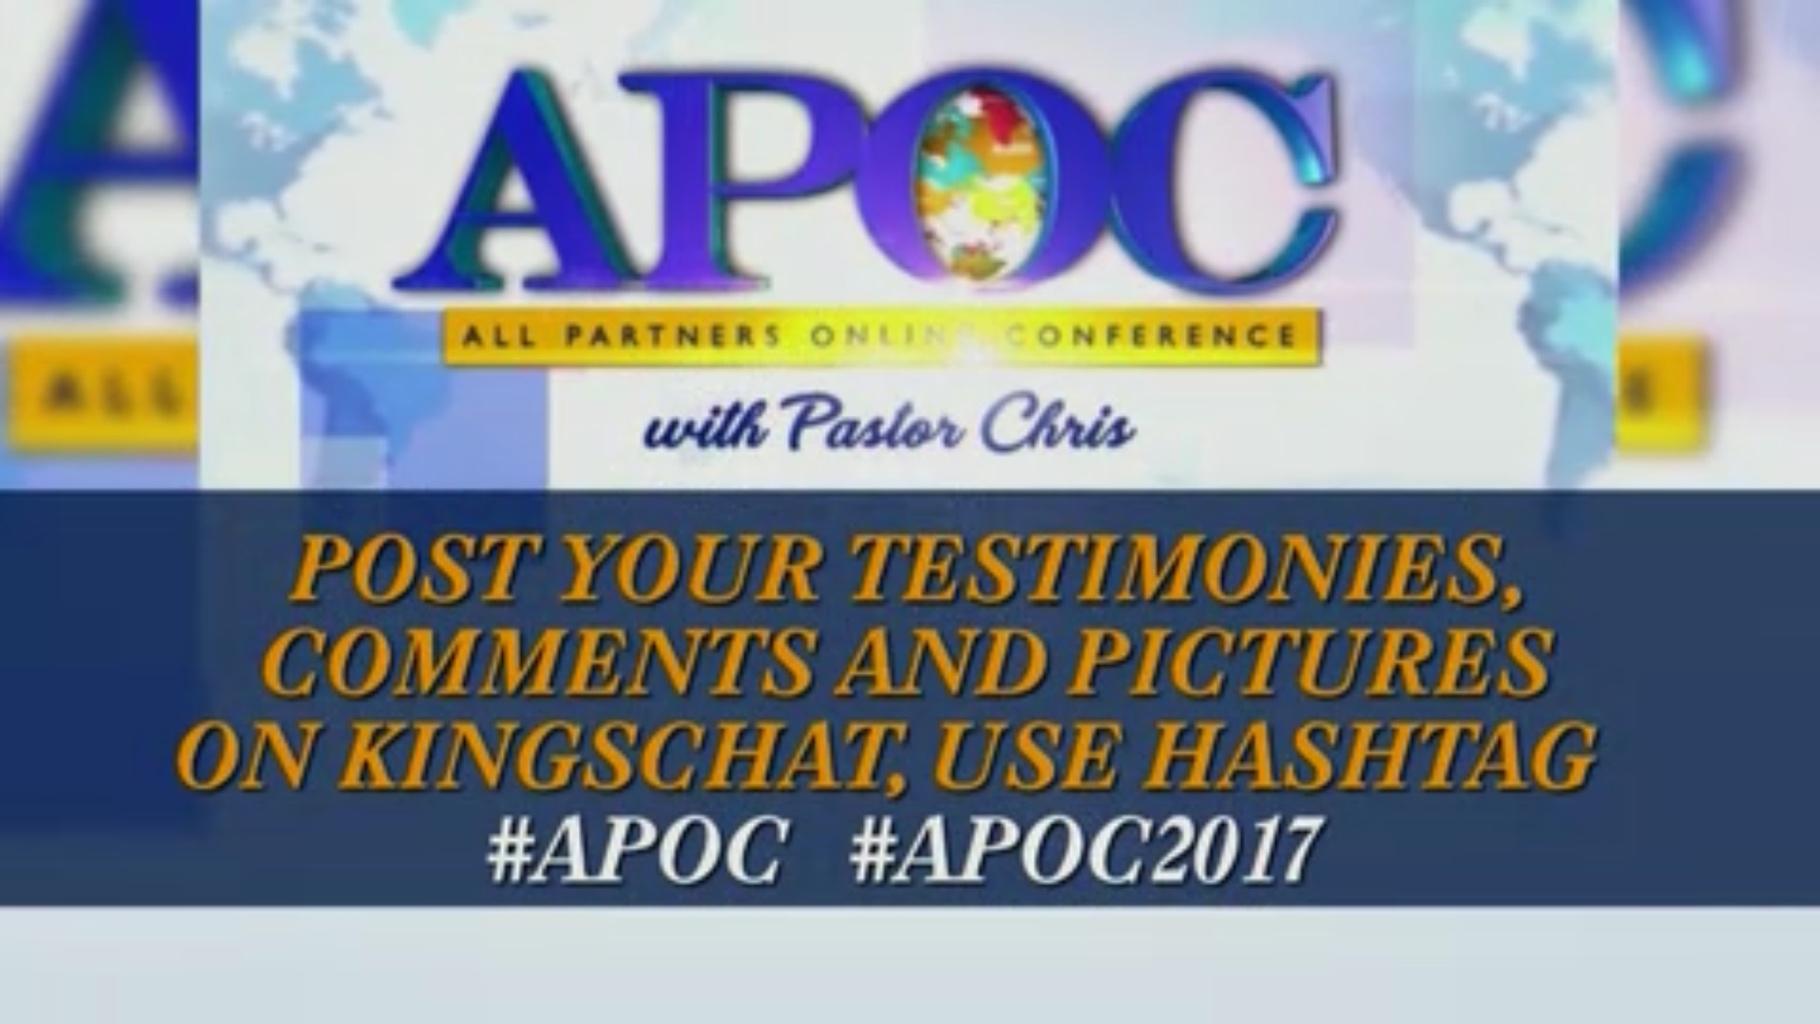 #APOC #APOC2017